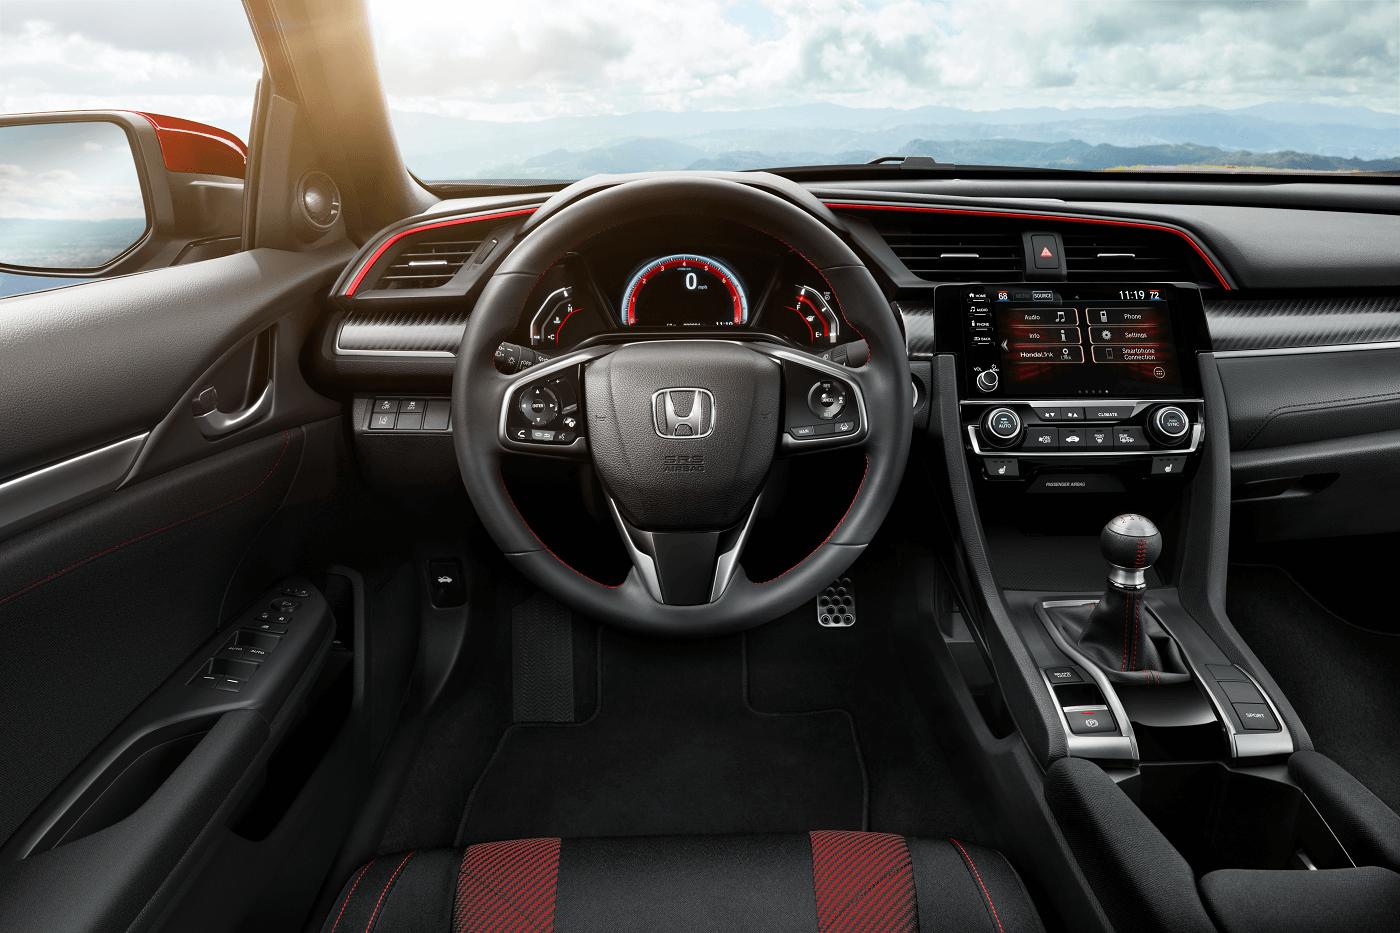 Honda Civic Si Interior Technology